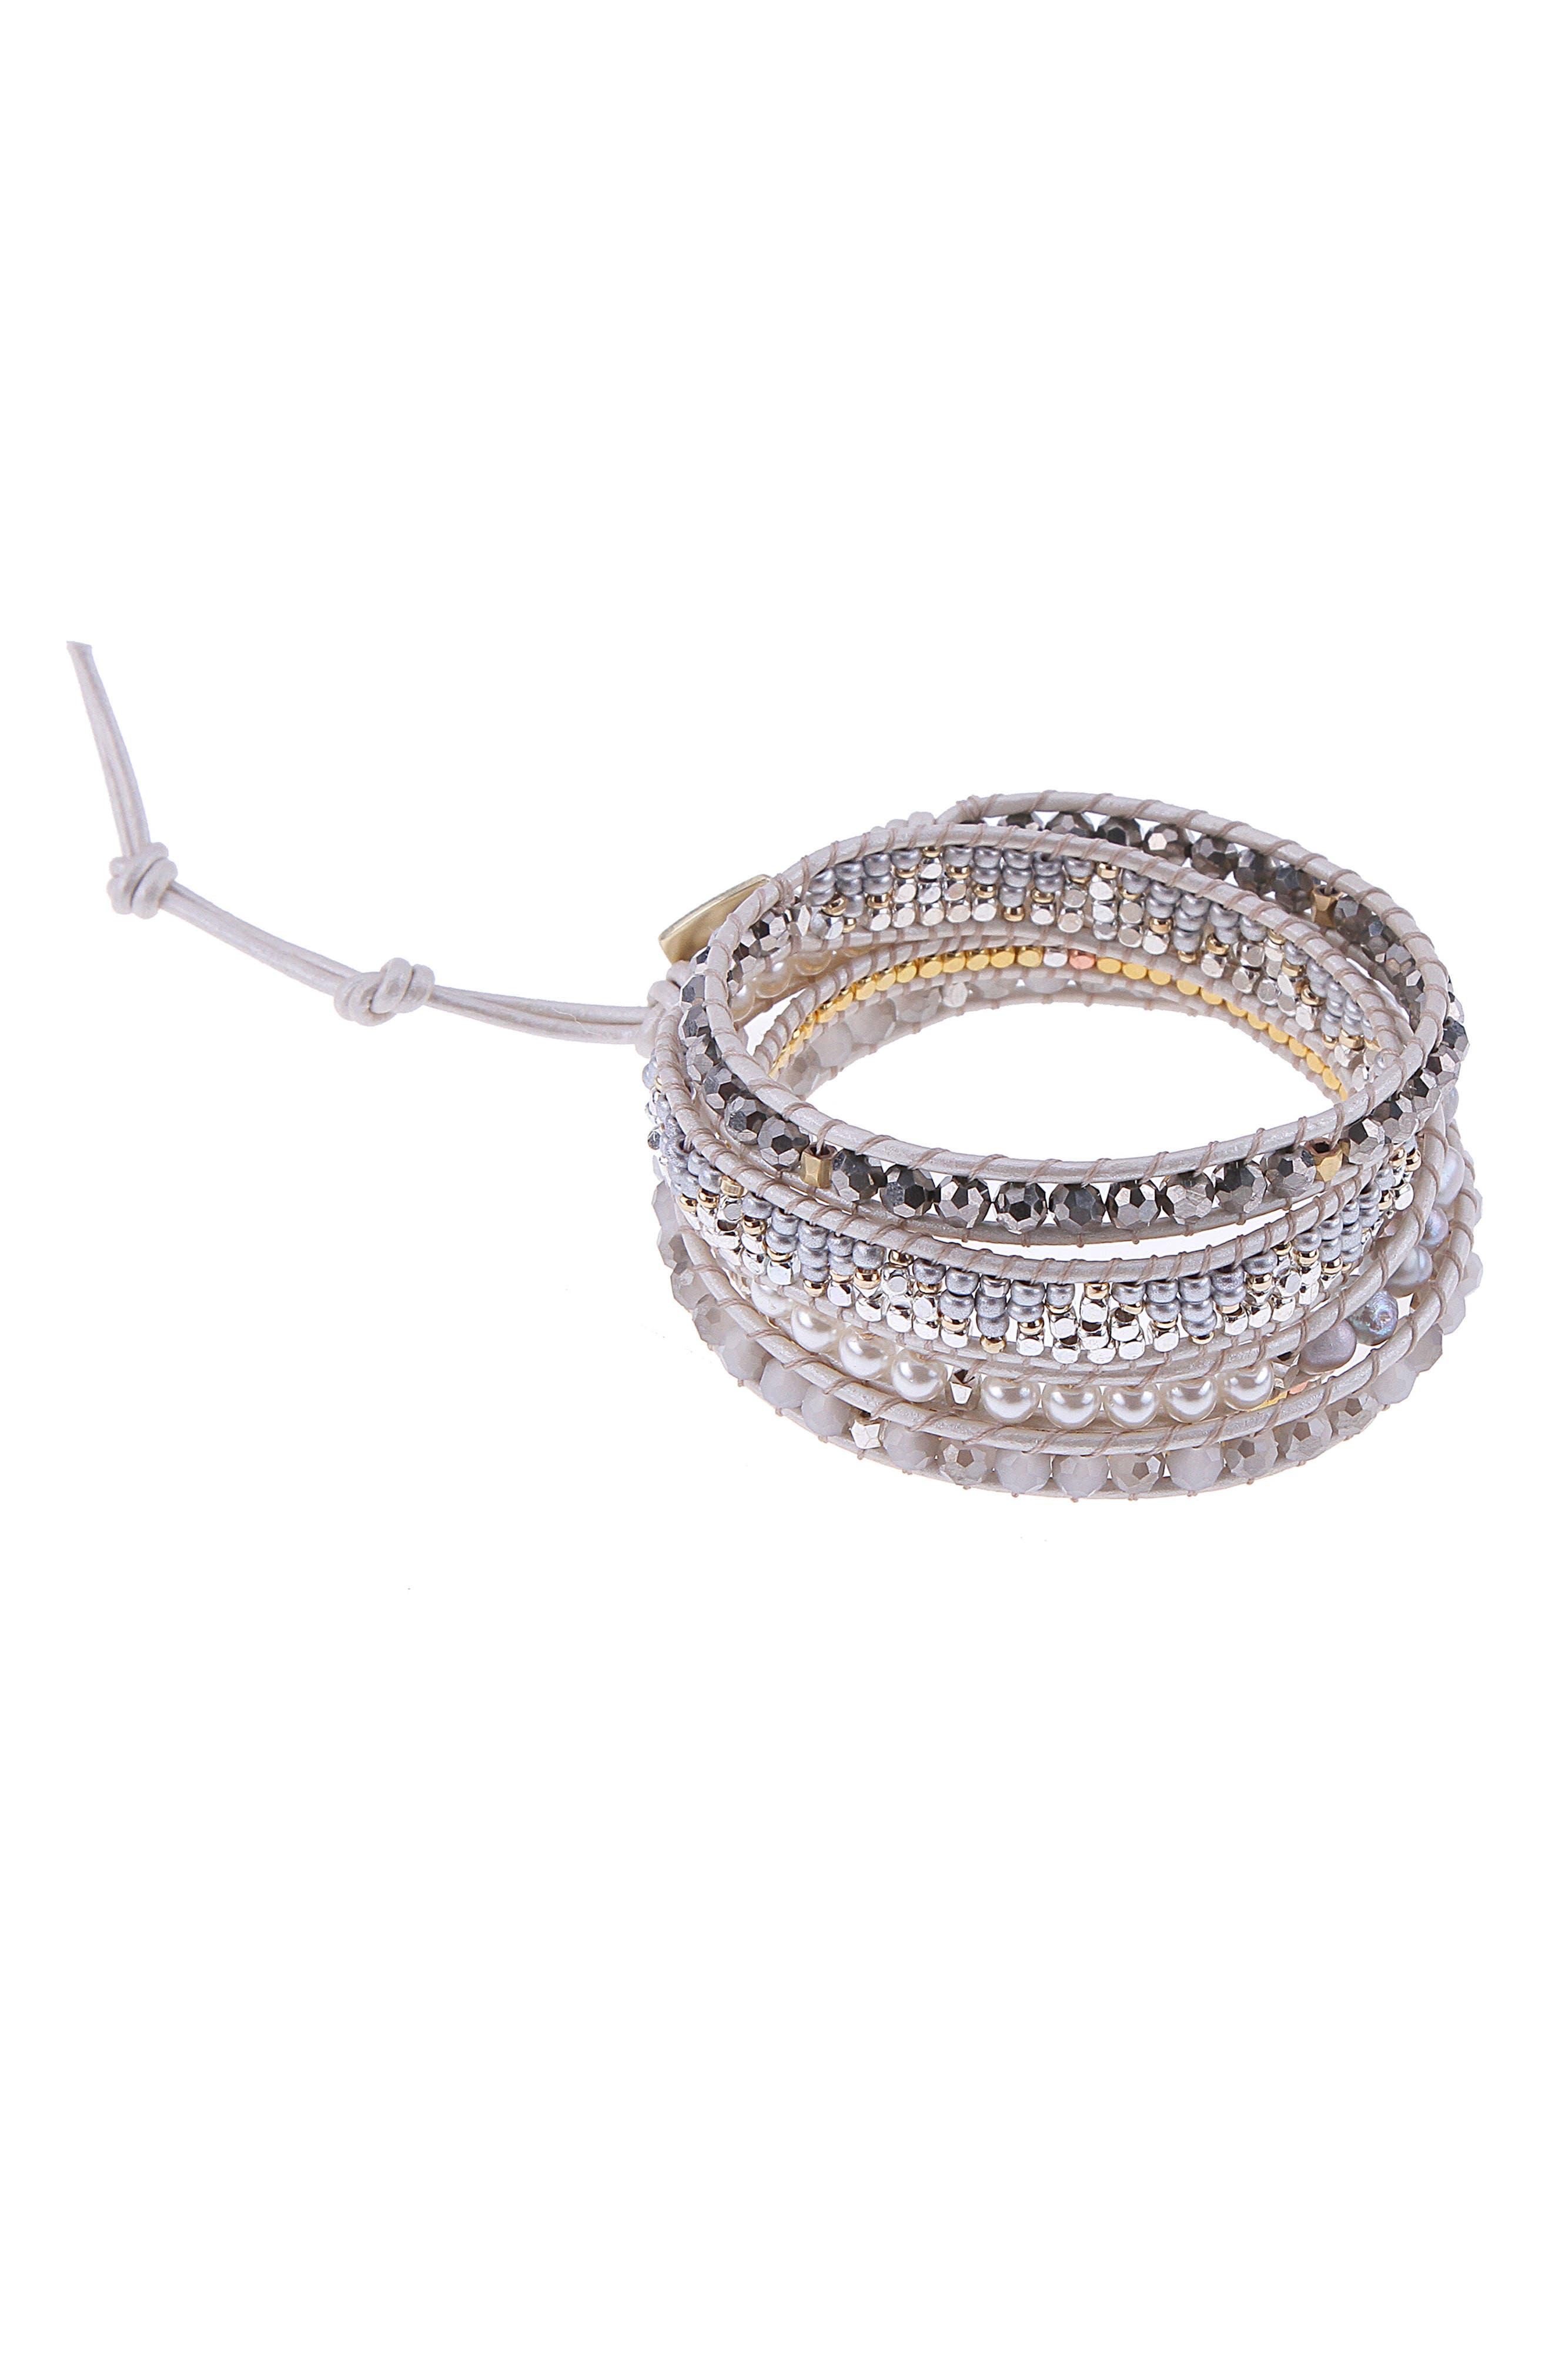 Crystal & Imitation Pearl Beaded Wrap Bracelet,                             Main thumbnail 1, color,                             100